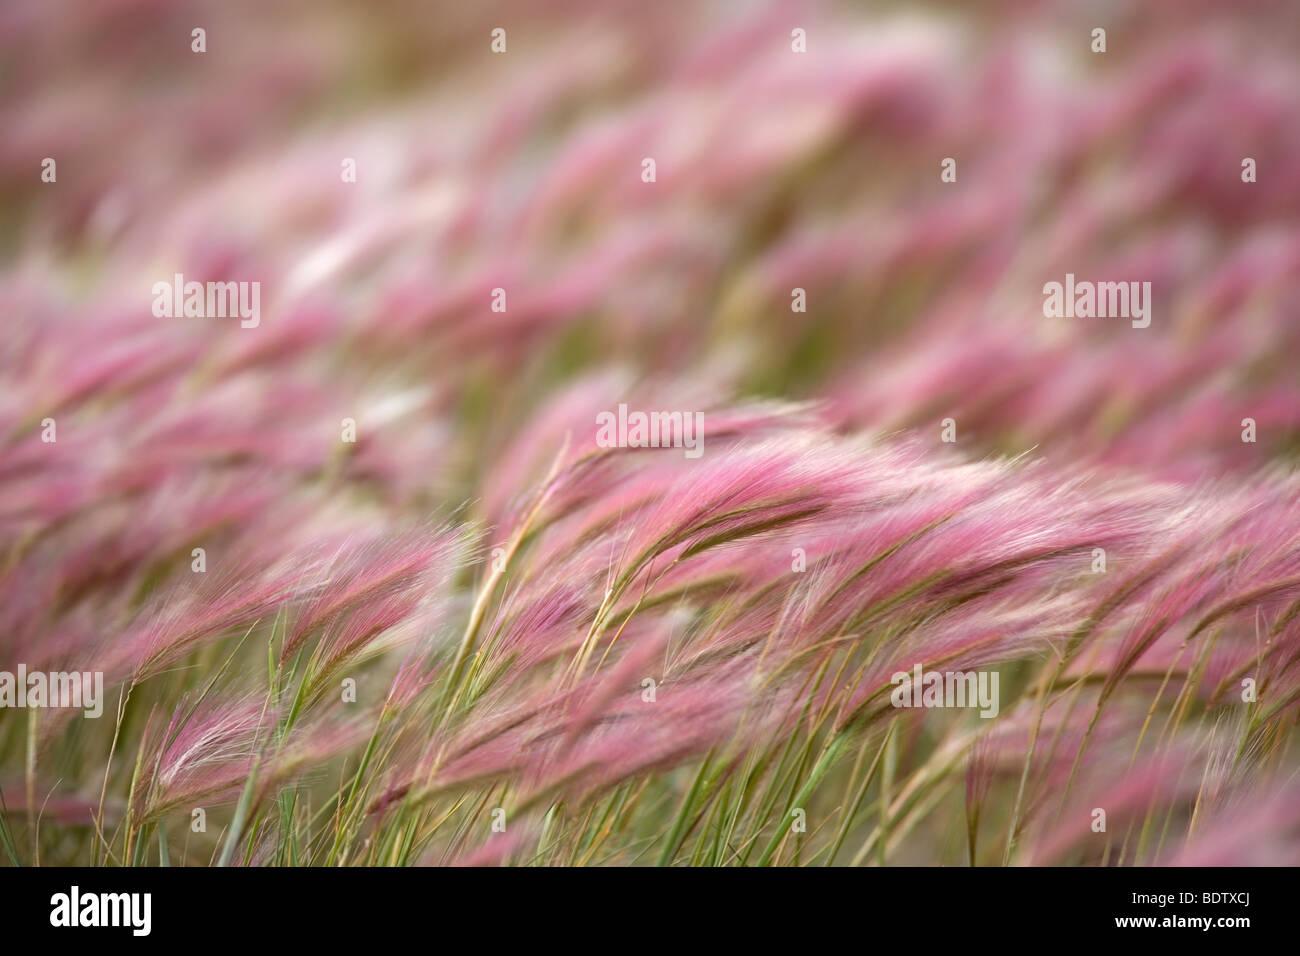 Maehnen-Gerste / Foxtail Barley / Hordeum jubatum - Stock Image